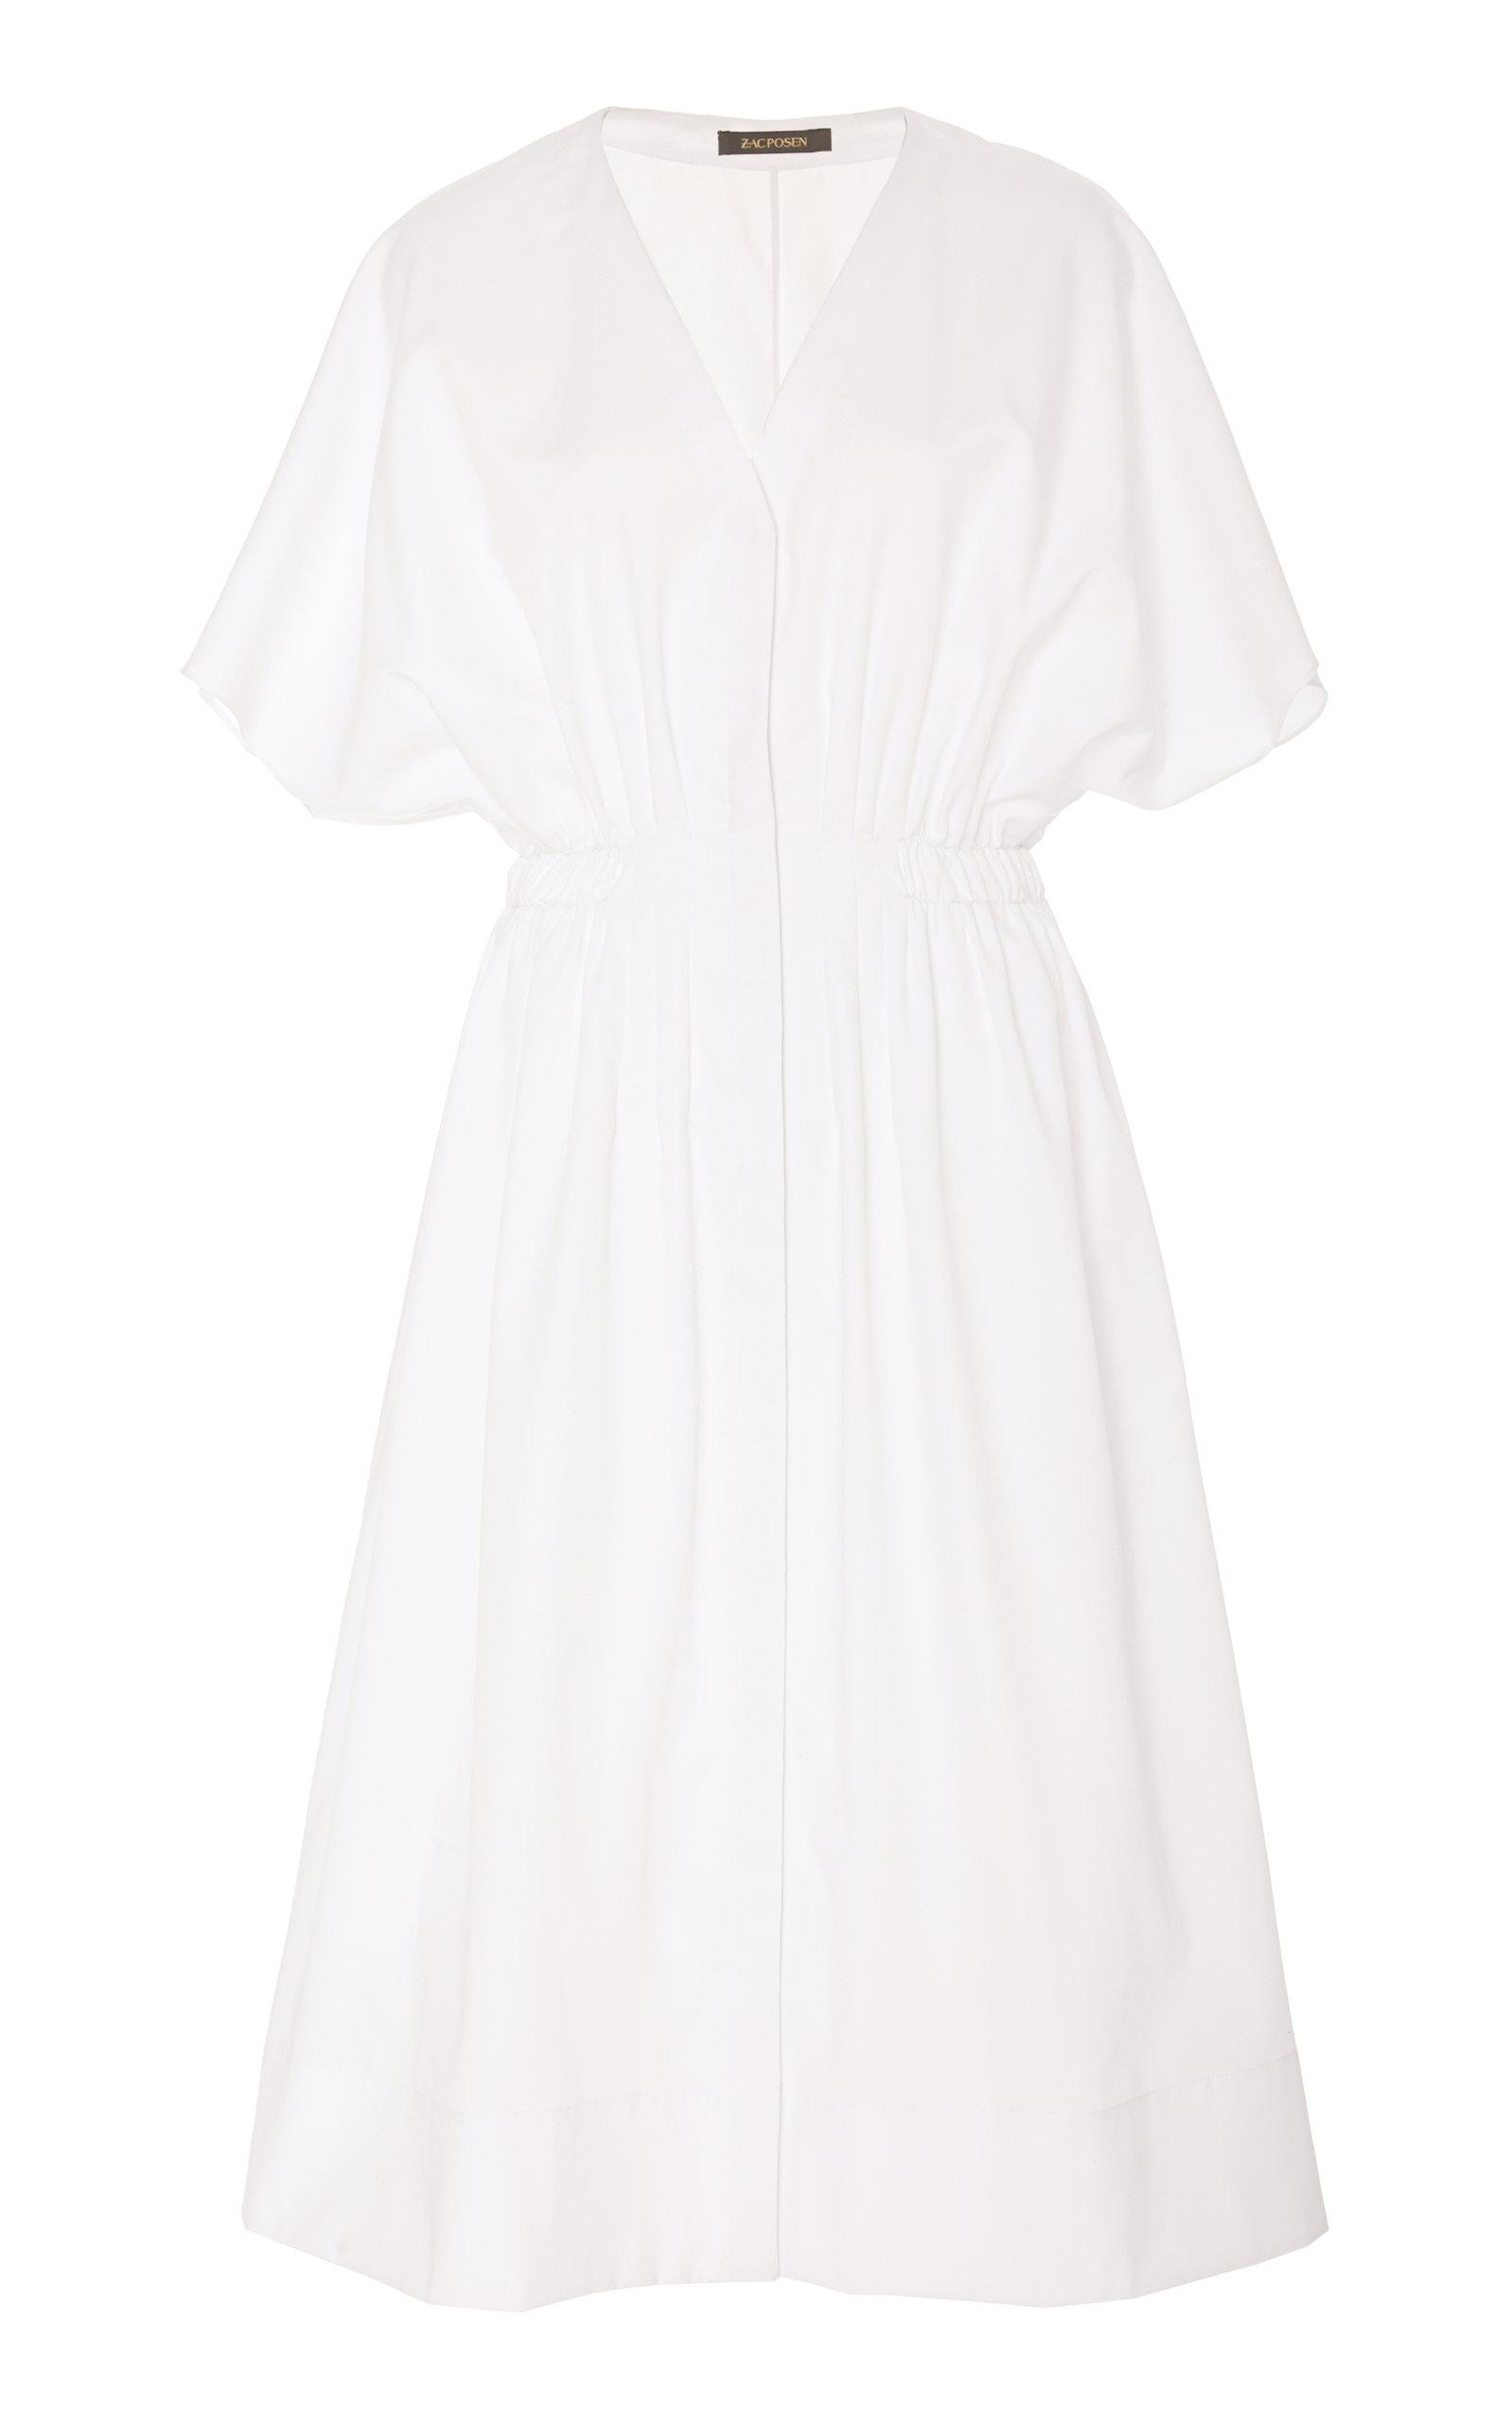 Buy Zac Posen Butterfly Sleeve Poplin Midi Dress online, shop Zac Posen at the best price